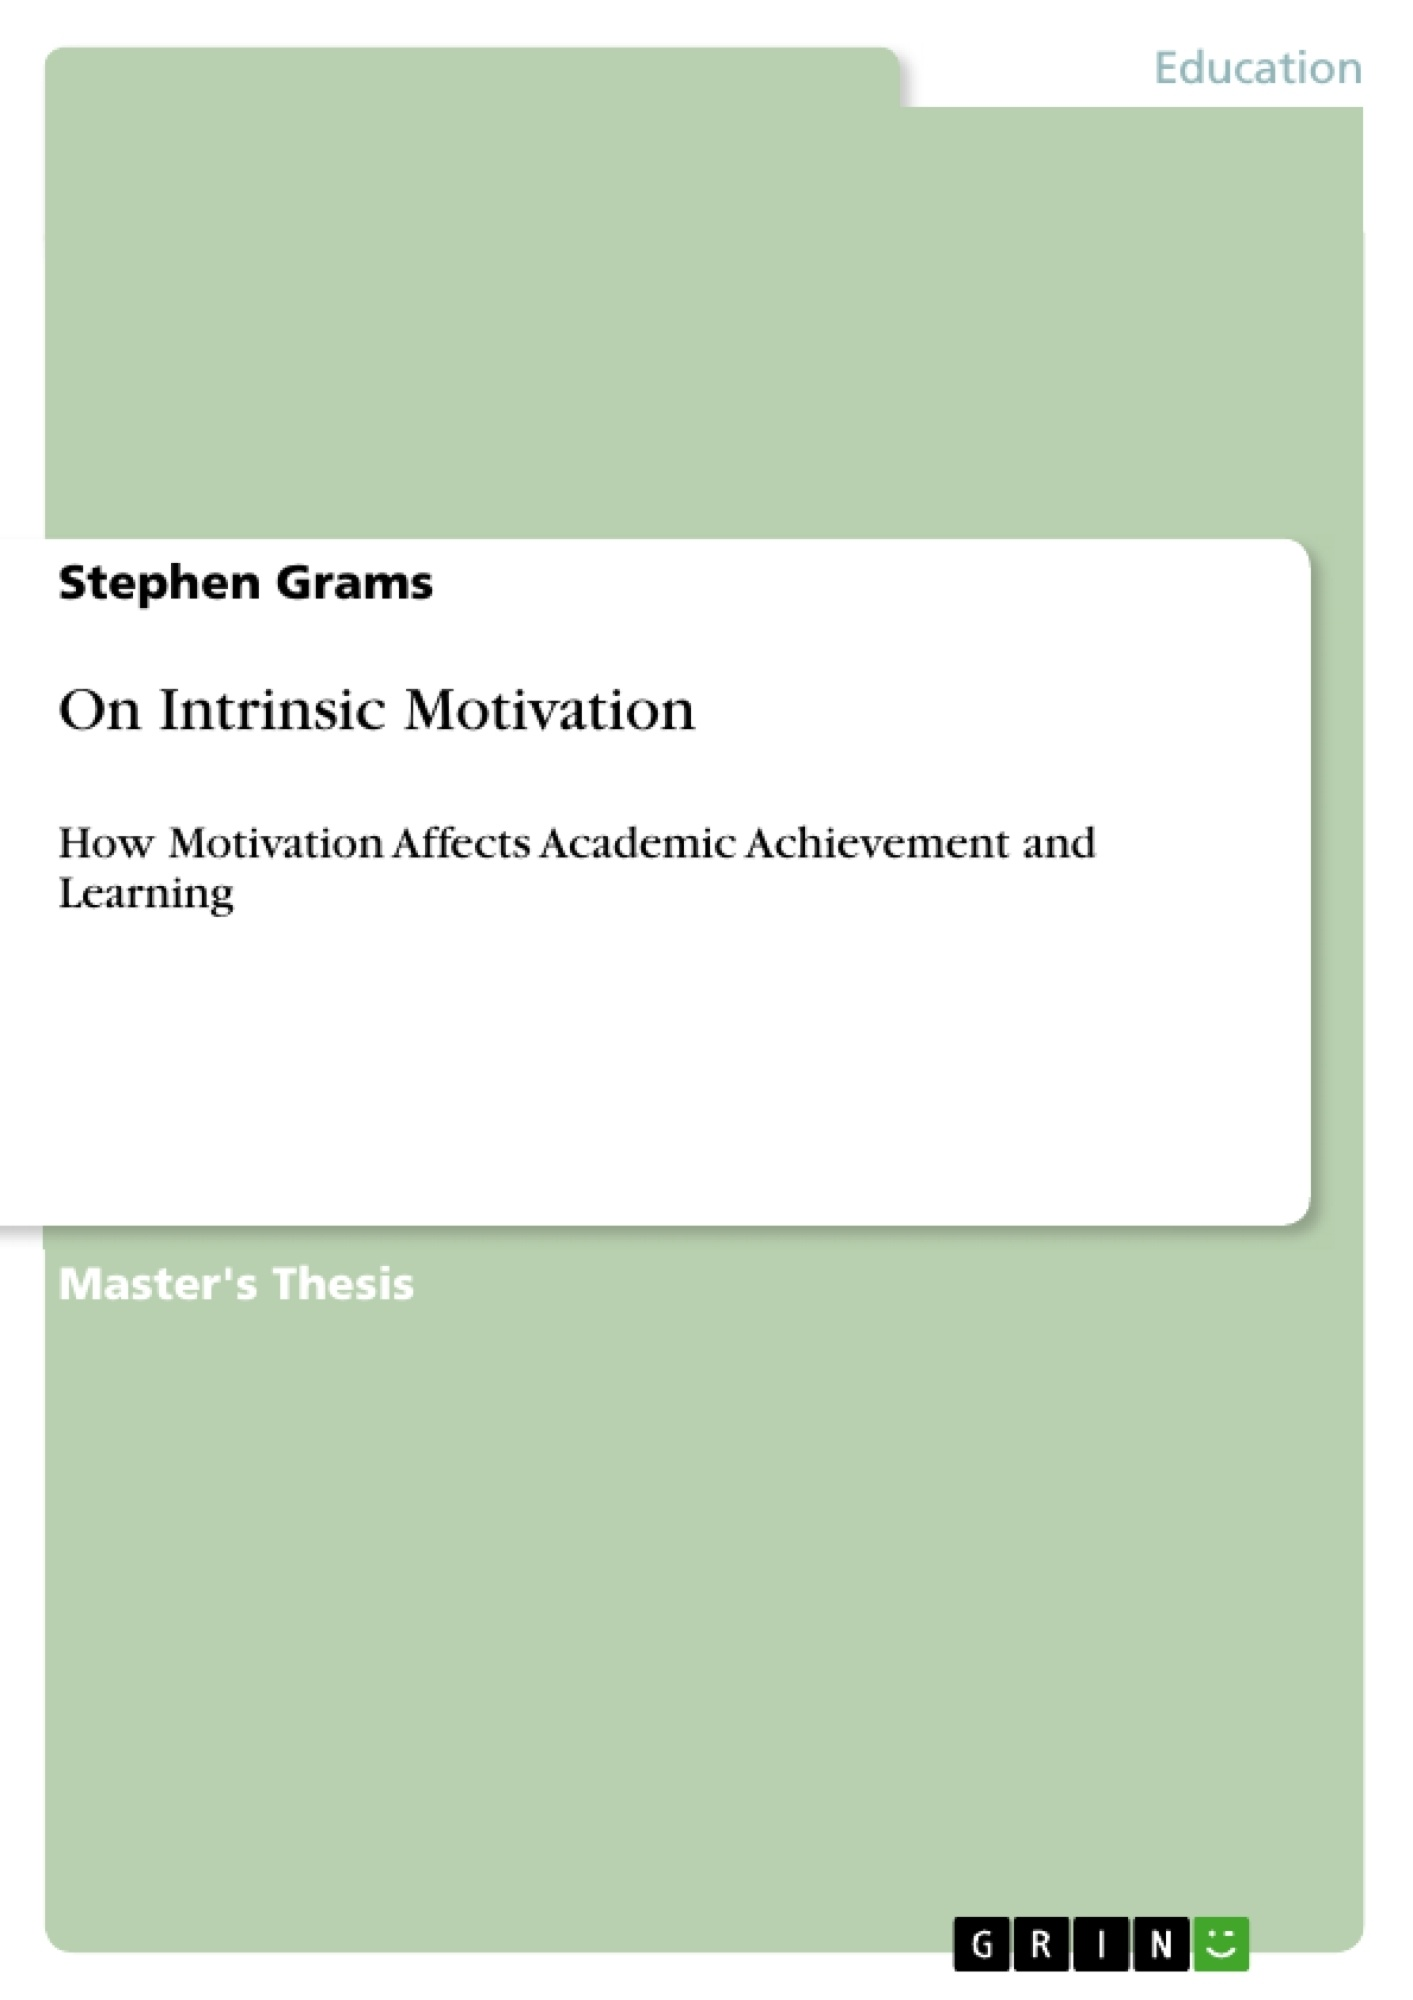 Title: On Intrinsic Motivation